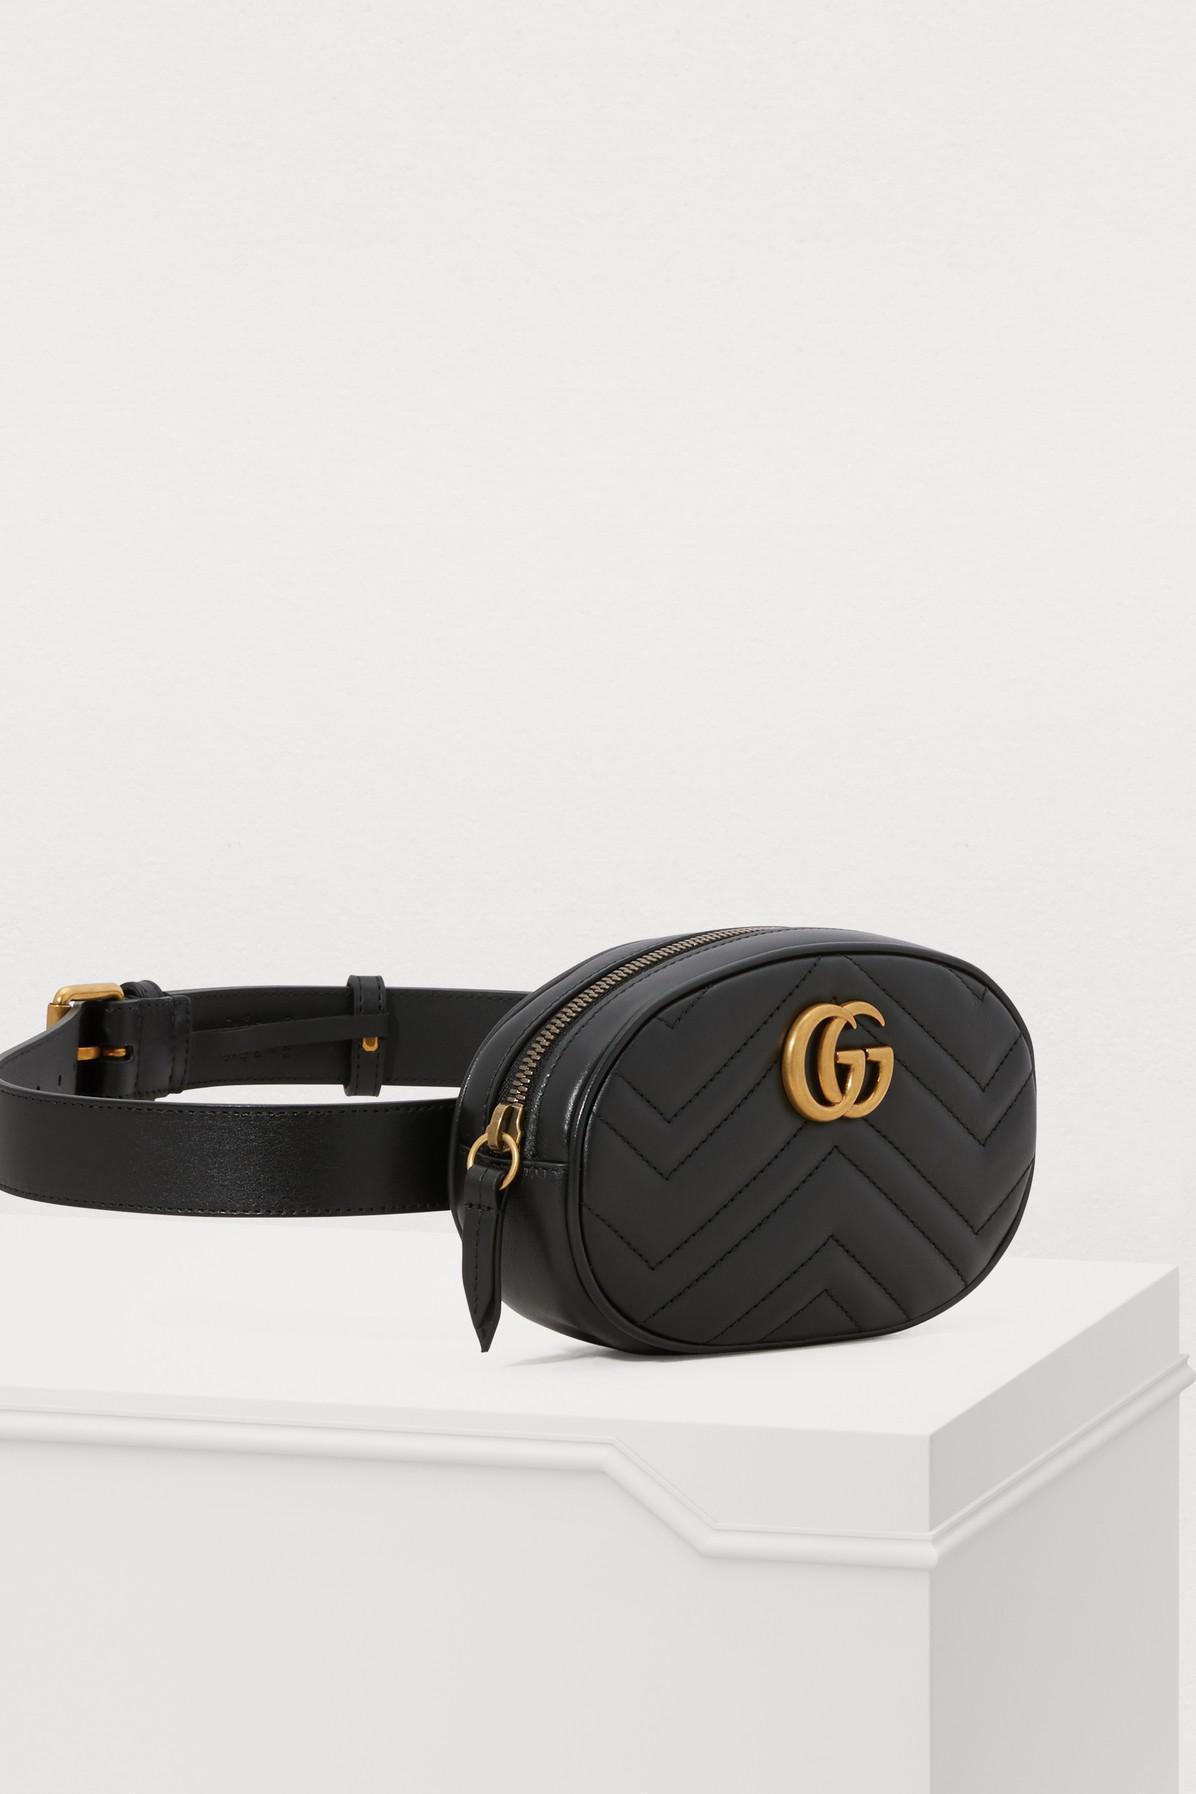 31825cbac Gucci - Black GG Marmont Belt Bag - Lyst. View fullscreen